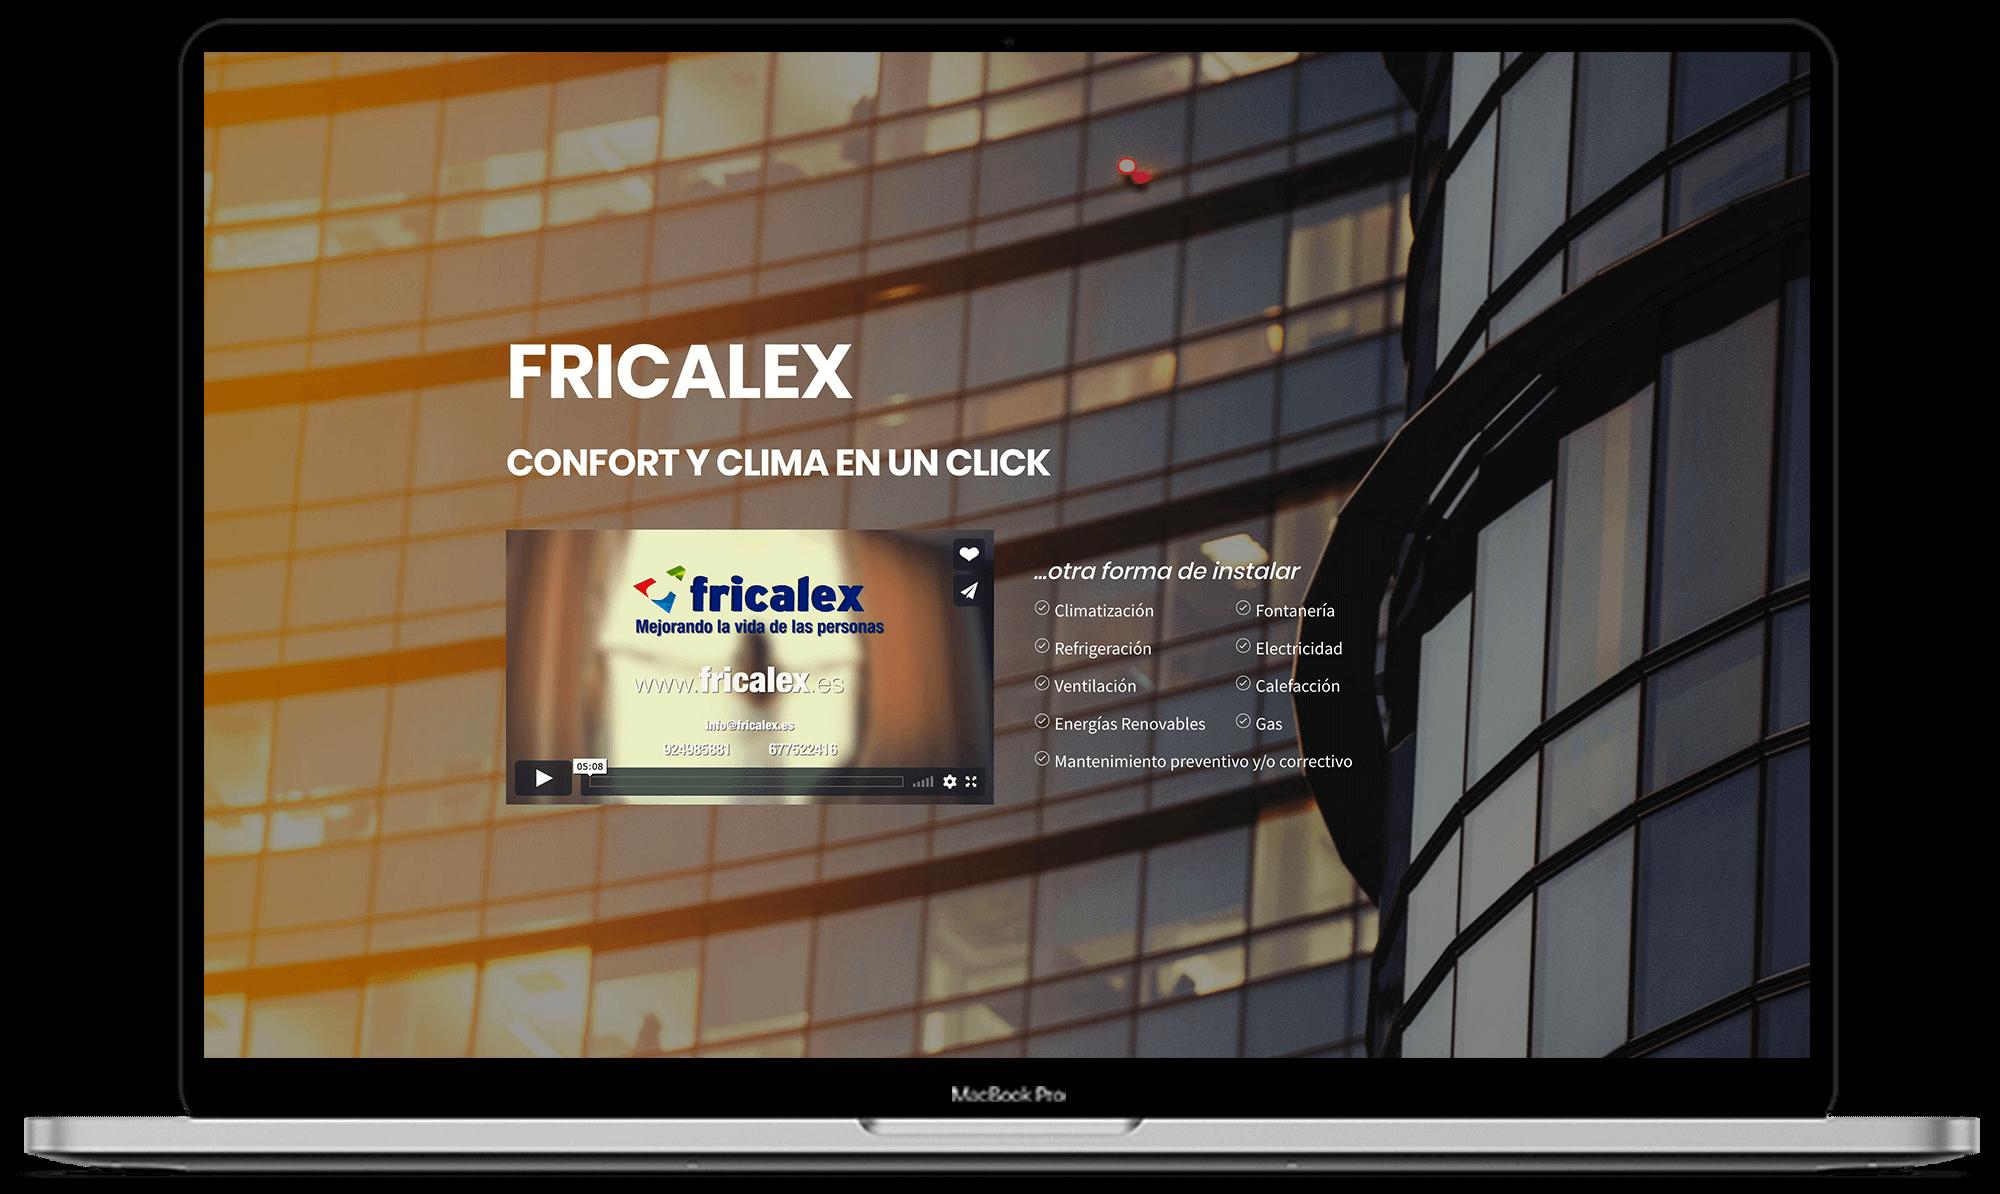 Fricalex diseño web - Synapse   Smart technologies